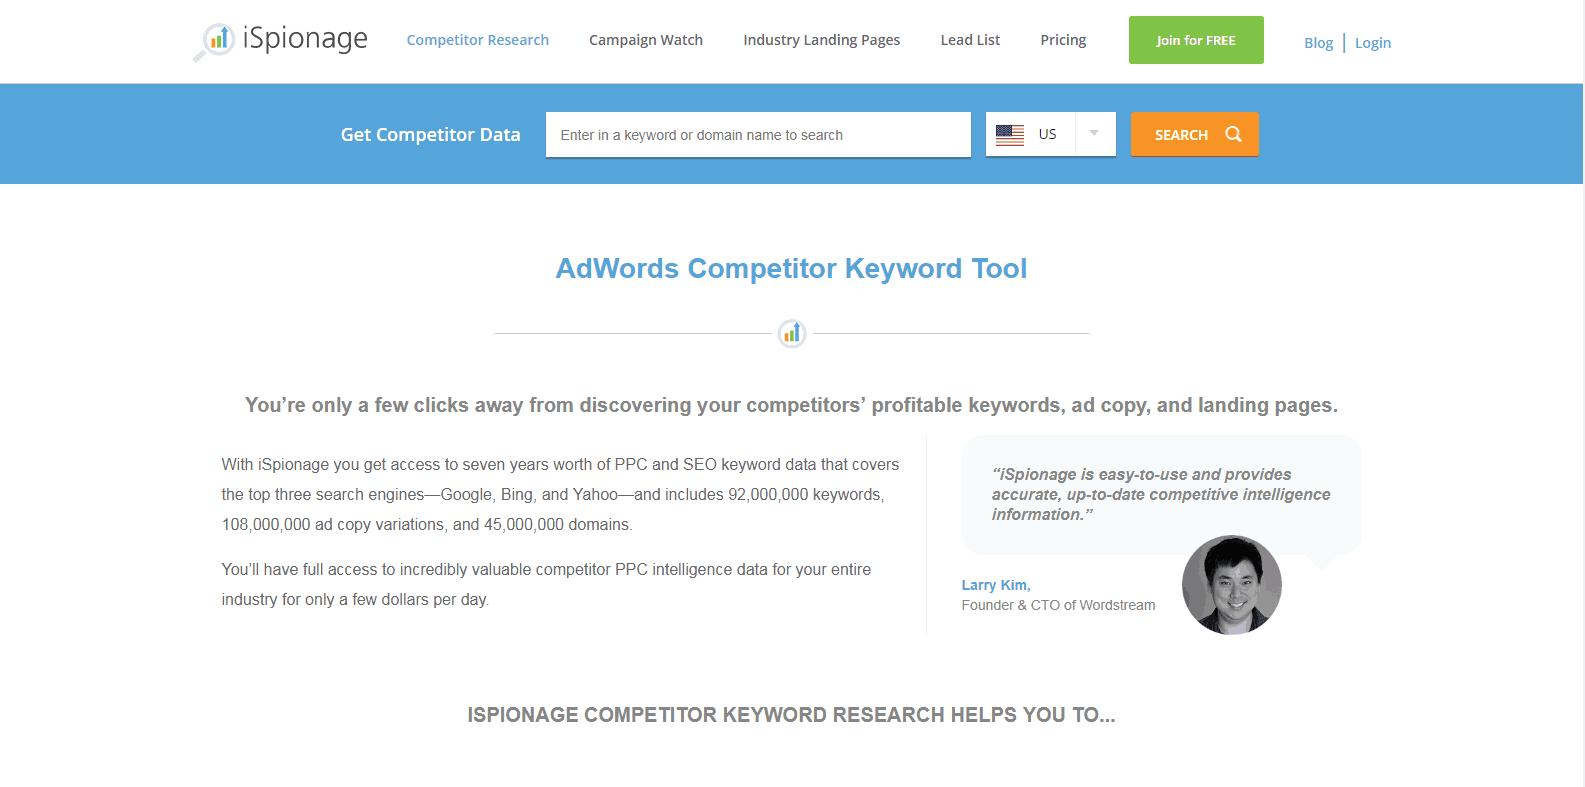 iSpionage Competitor Analysis Tools